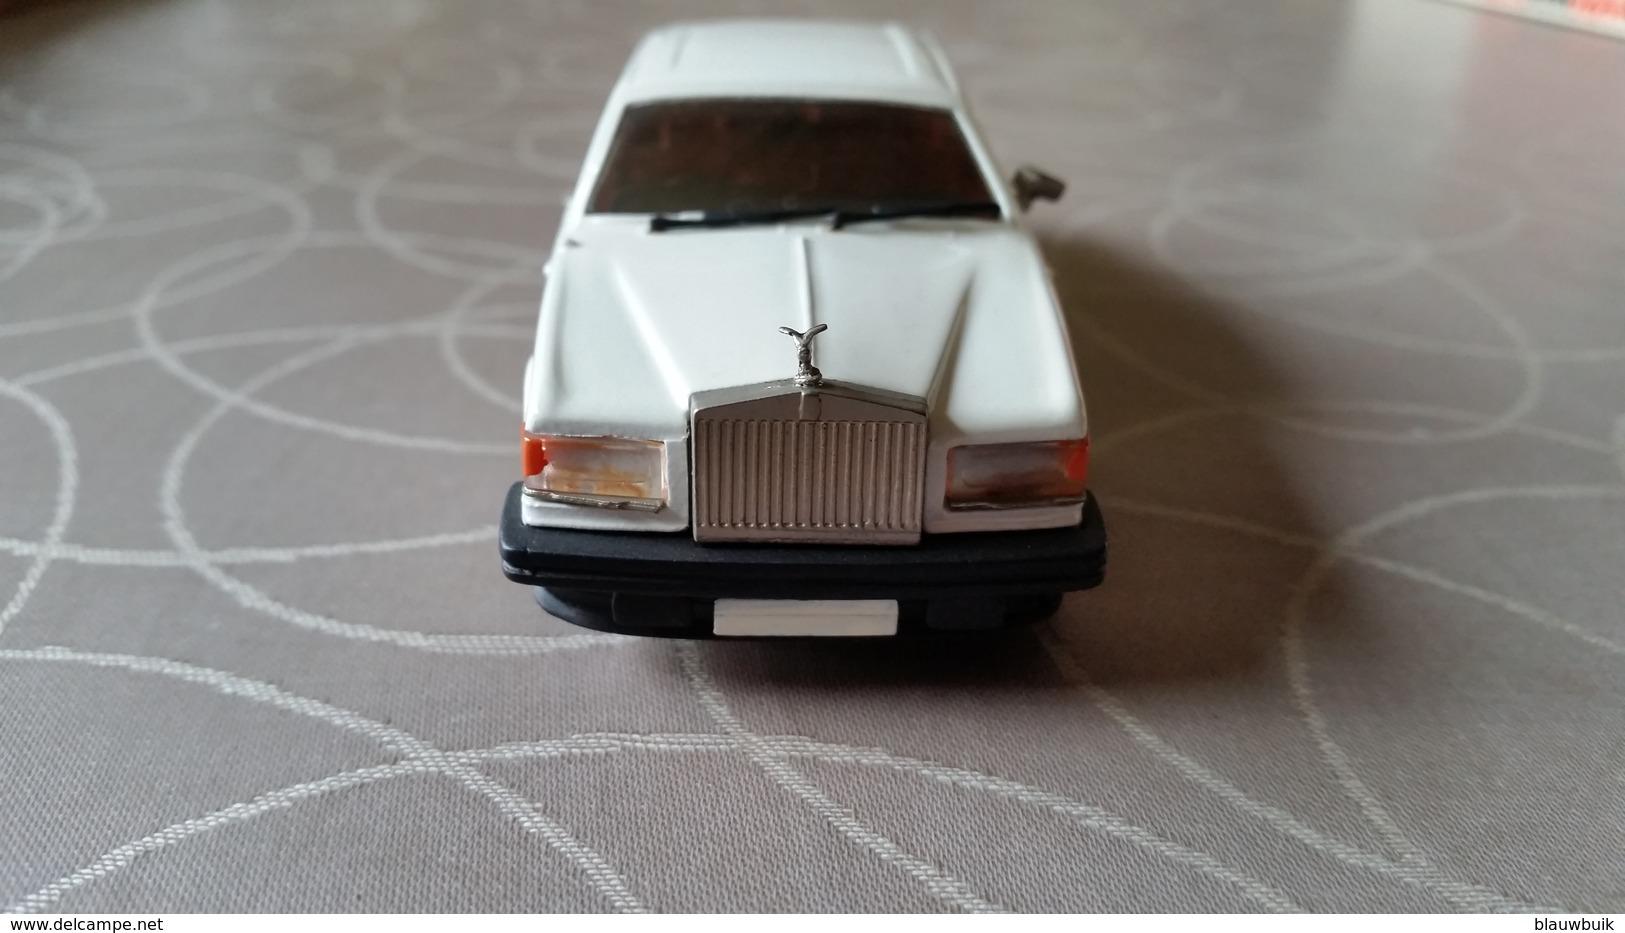 Western Models Wp105 Rolls-Royce Silver Spirit - Cars & 4-wheels